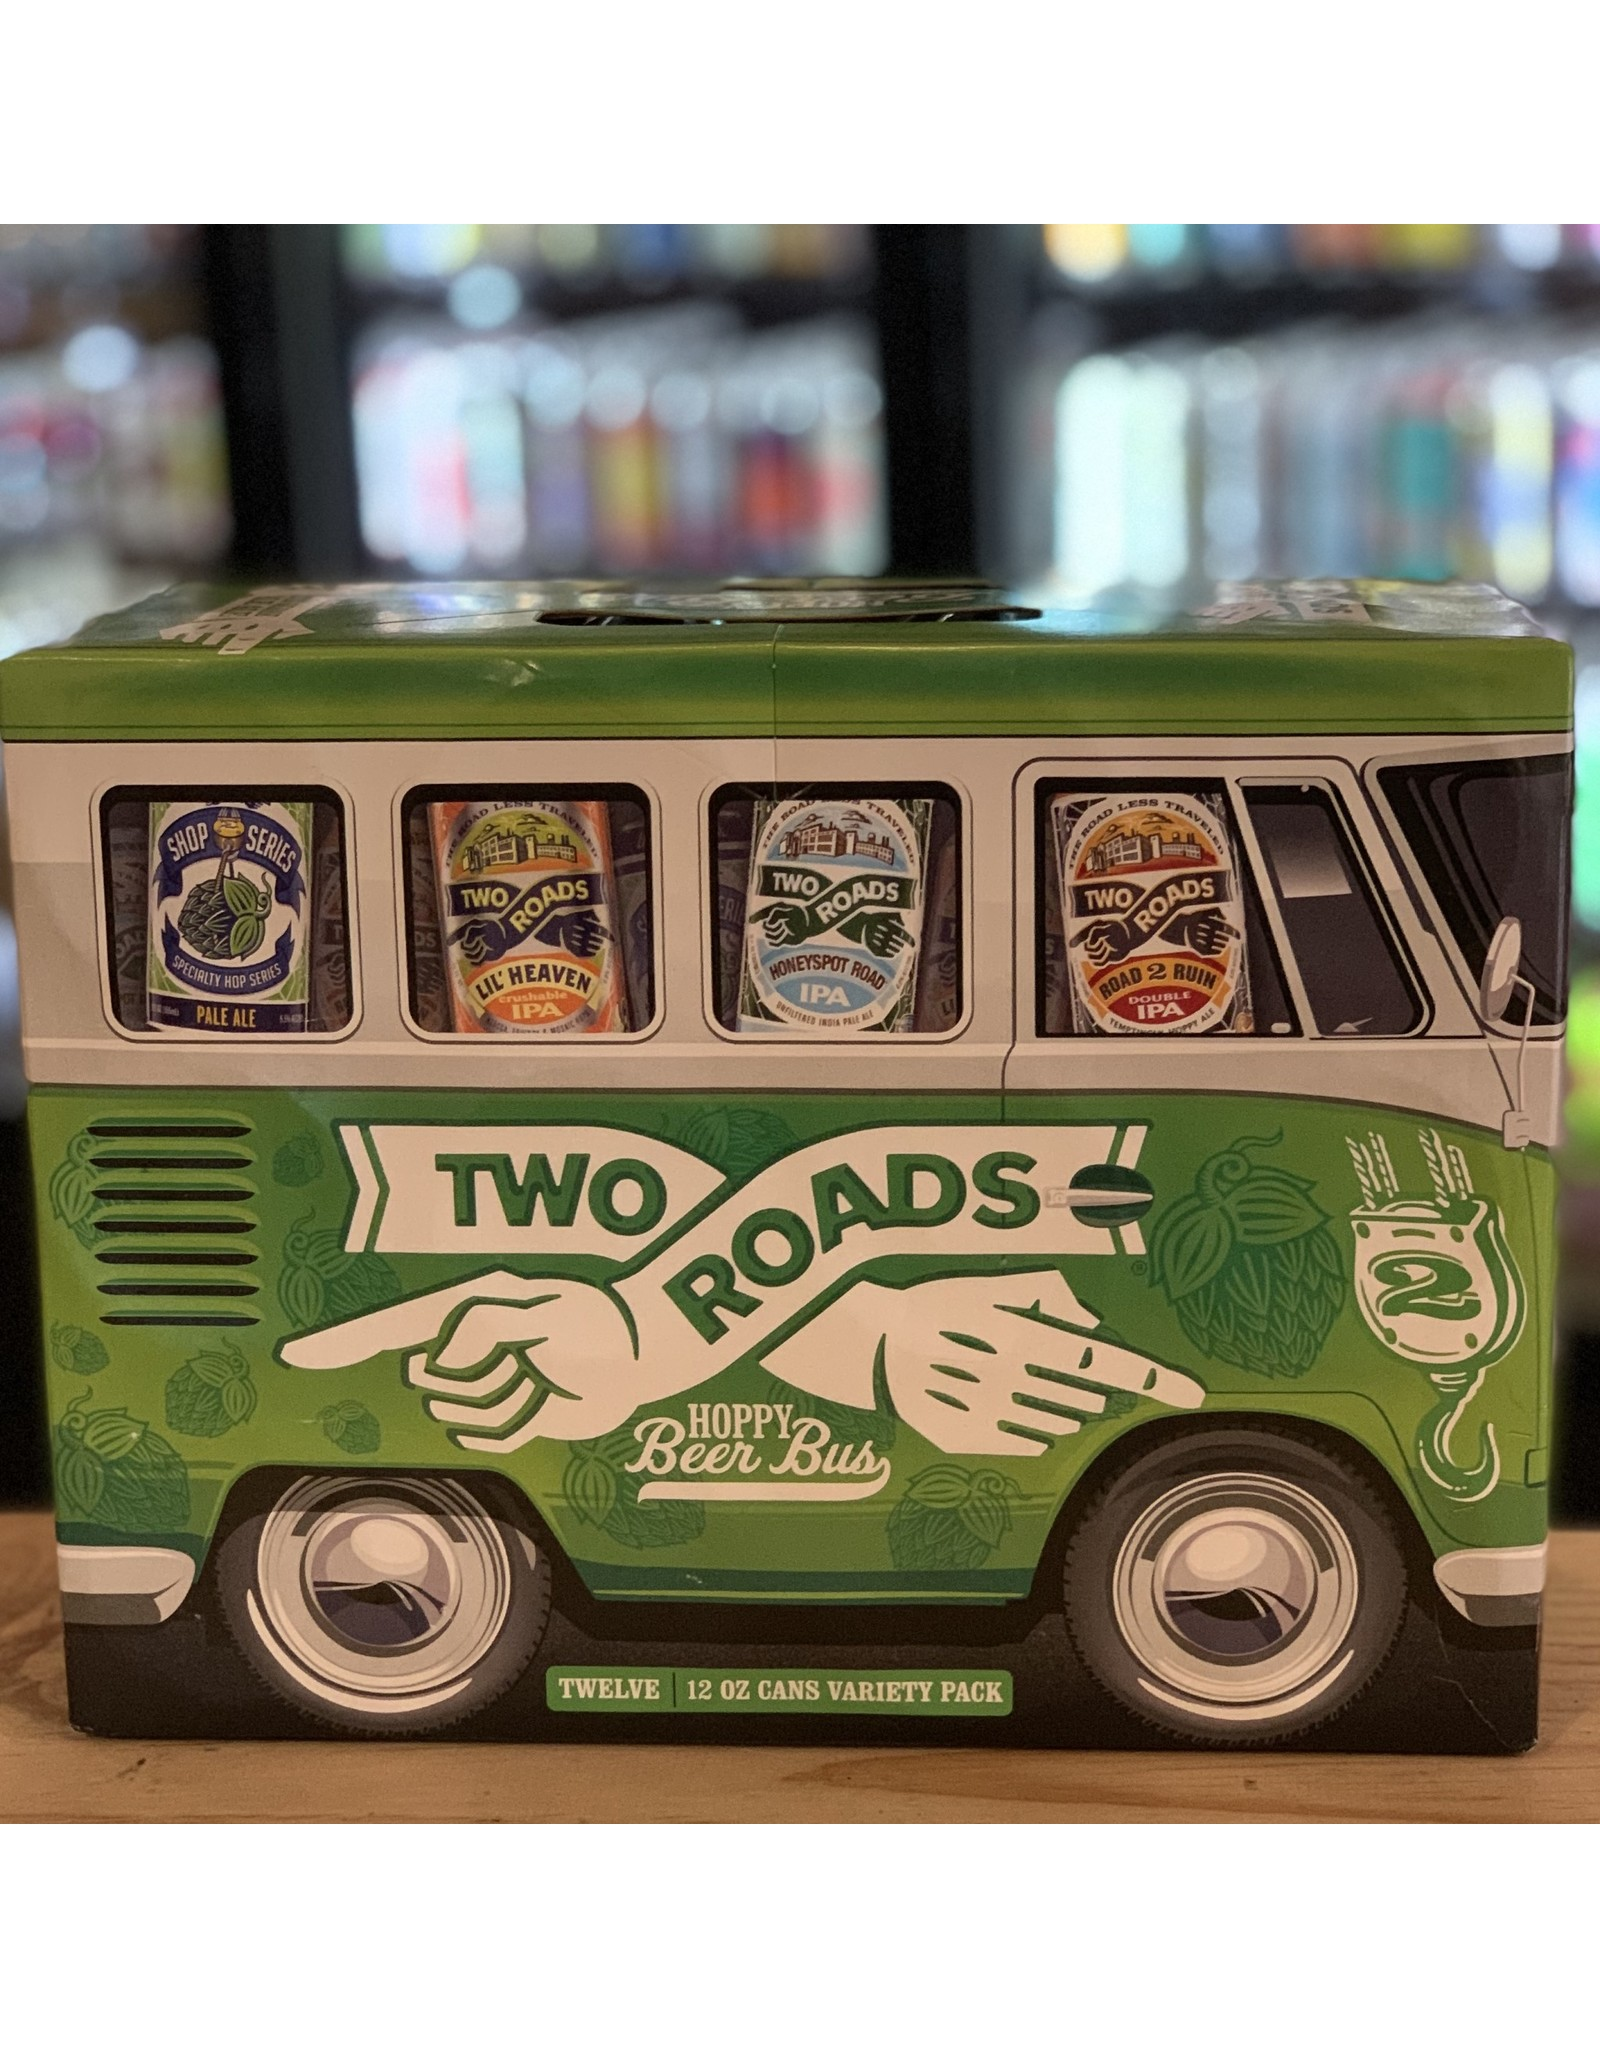 12-Pack Two Roads ''Beer Bus'' Variety Pack - Stratford, CT